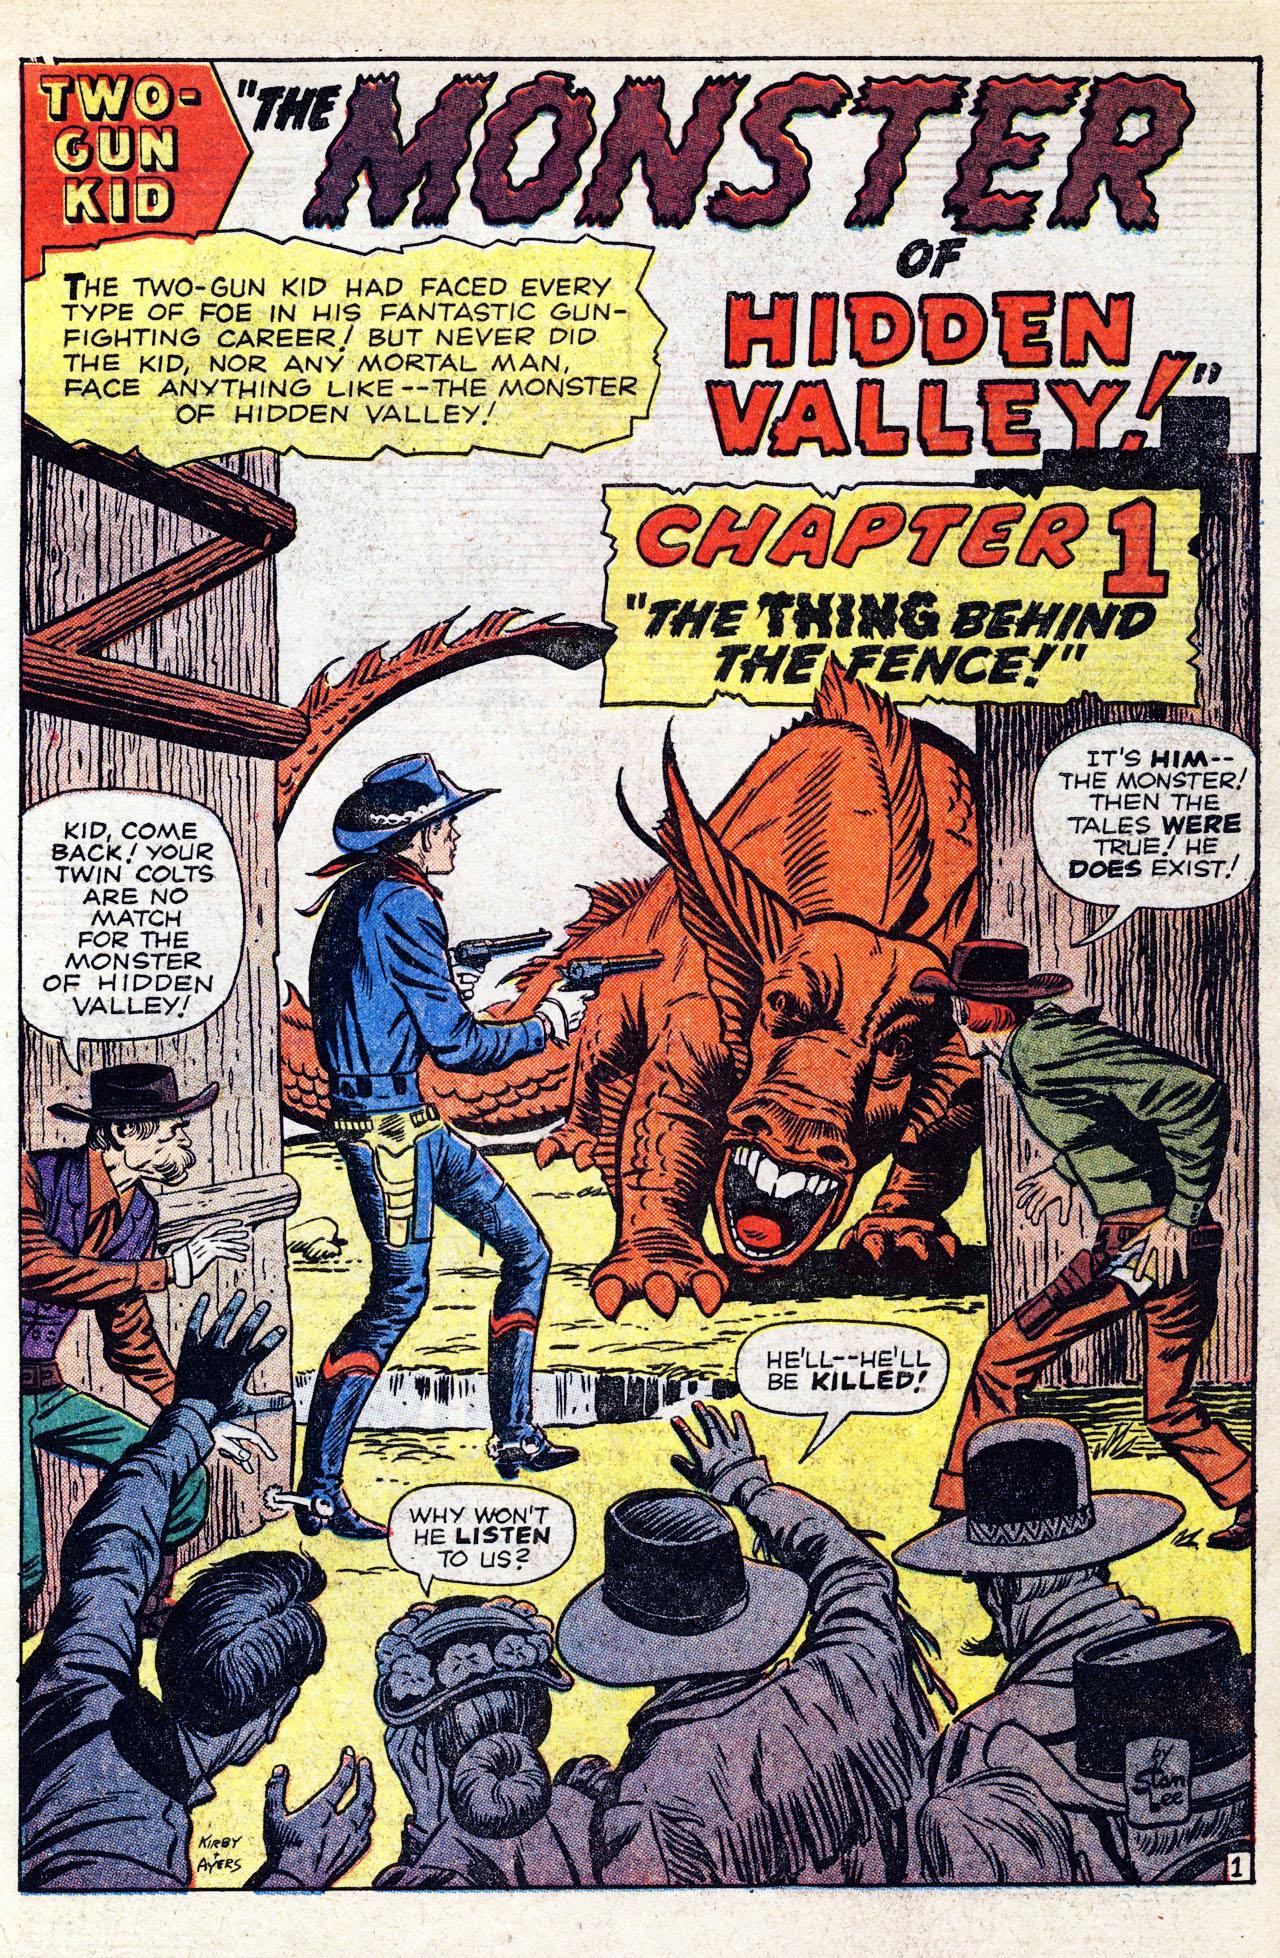 Read online Two-Gun Kid comic -  Issue #58 - 3